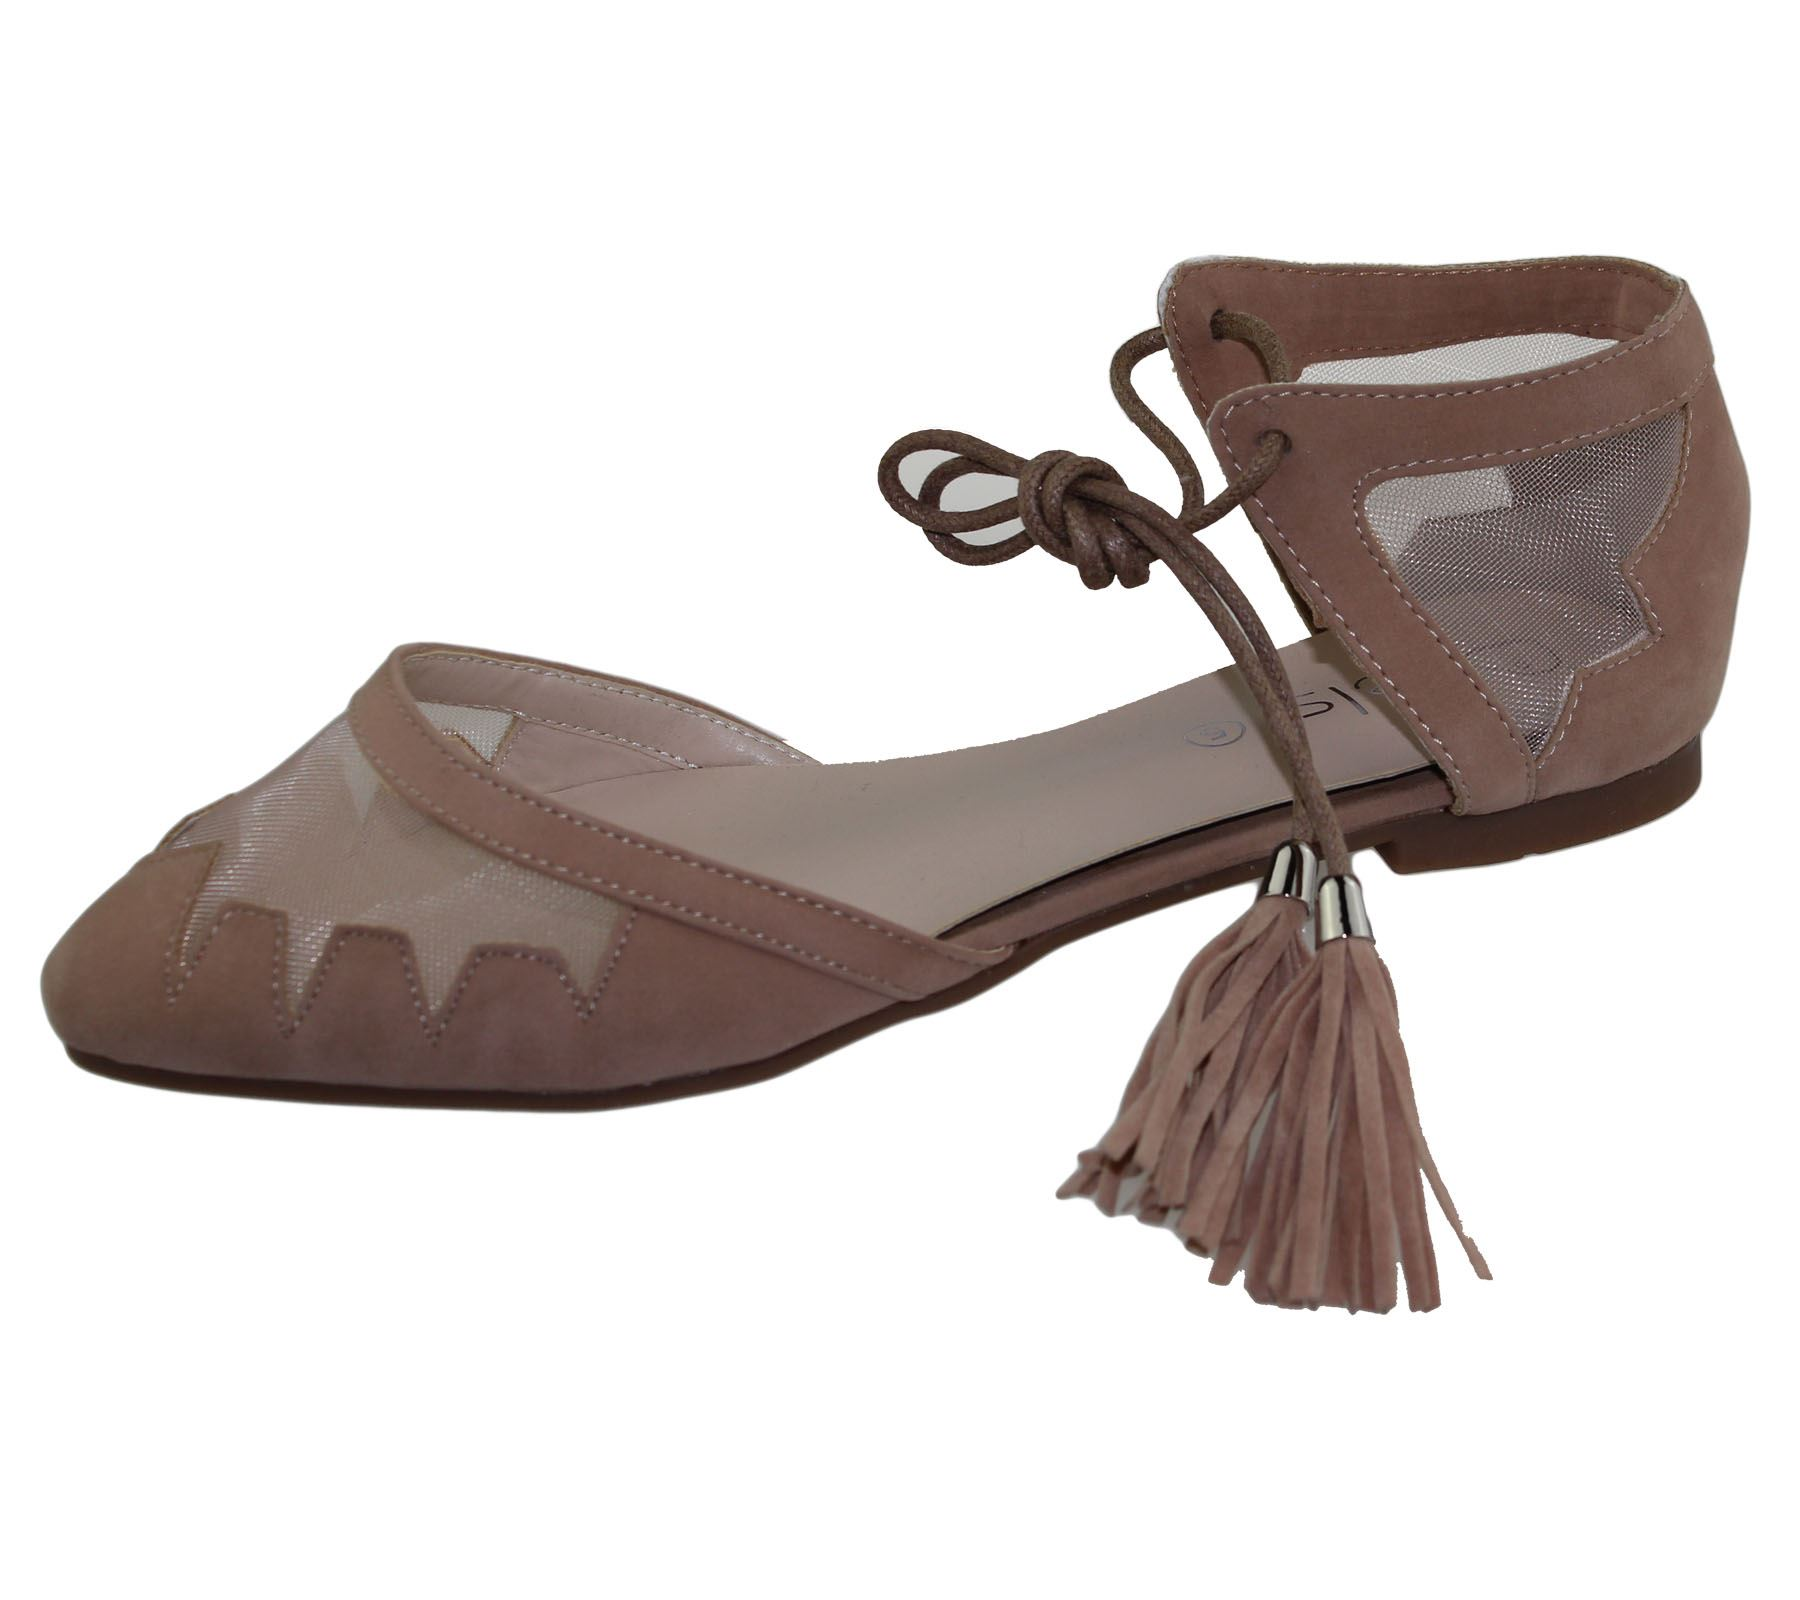 Womens-Flat-Ballerina-Dolly-Pumps-Ballet-Ladies-Summer-Mesh-Tassel-Shoes-Sandals thumbnail 25